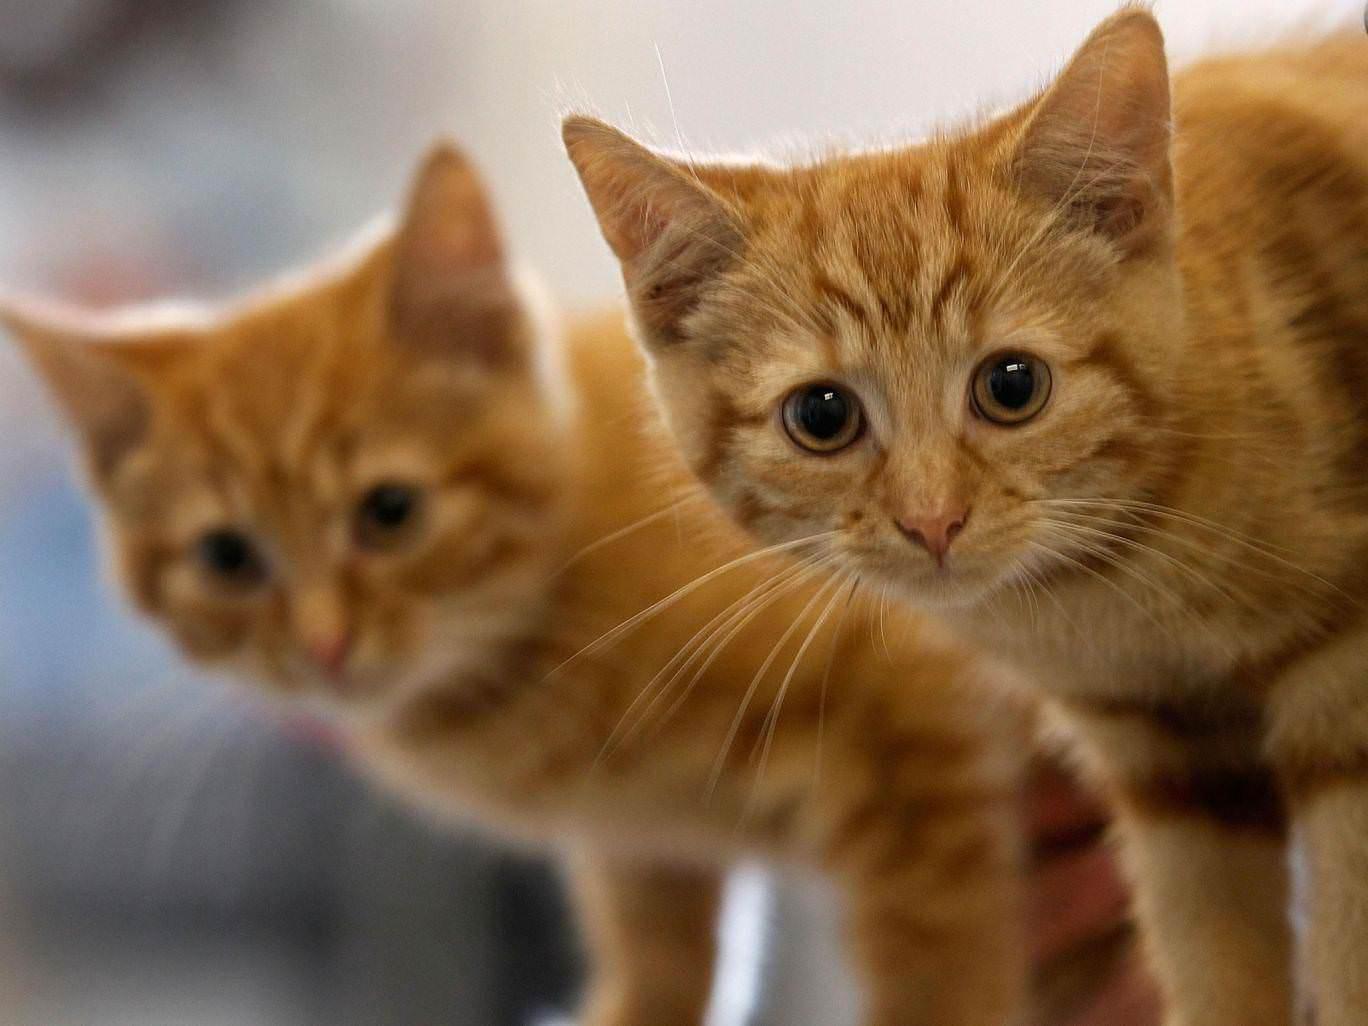 Croydon Cat Killer death toll reaches 400 animals